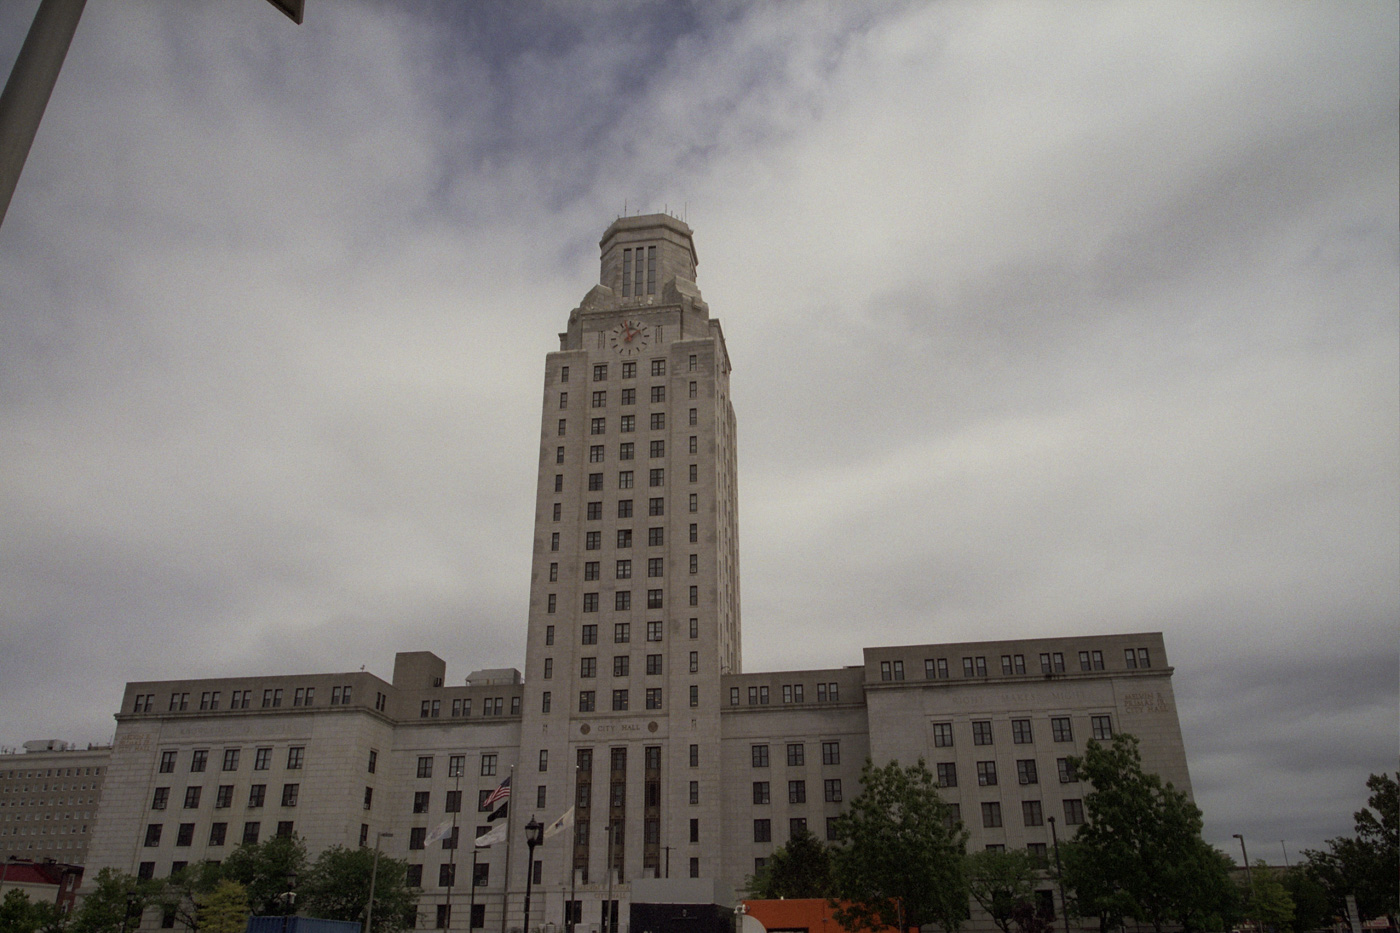 Camden City Hall